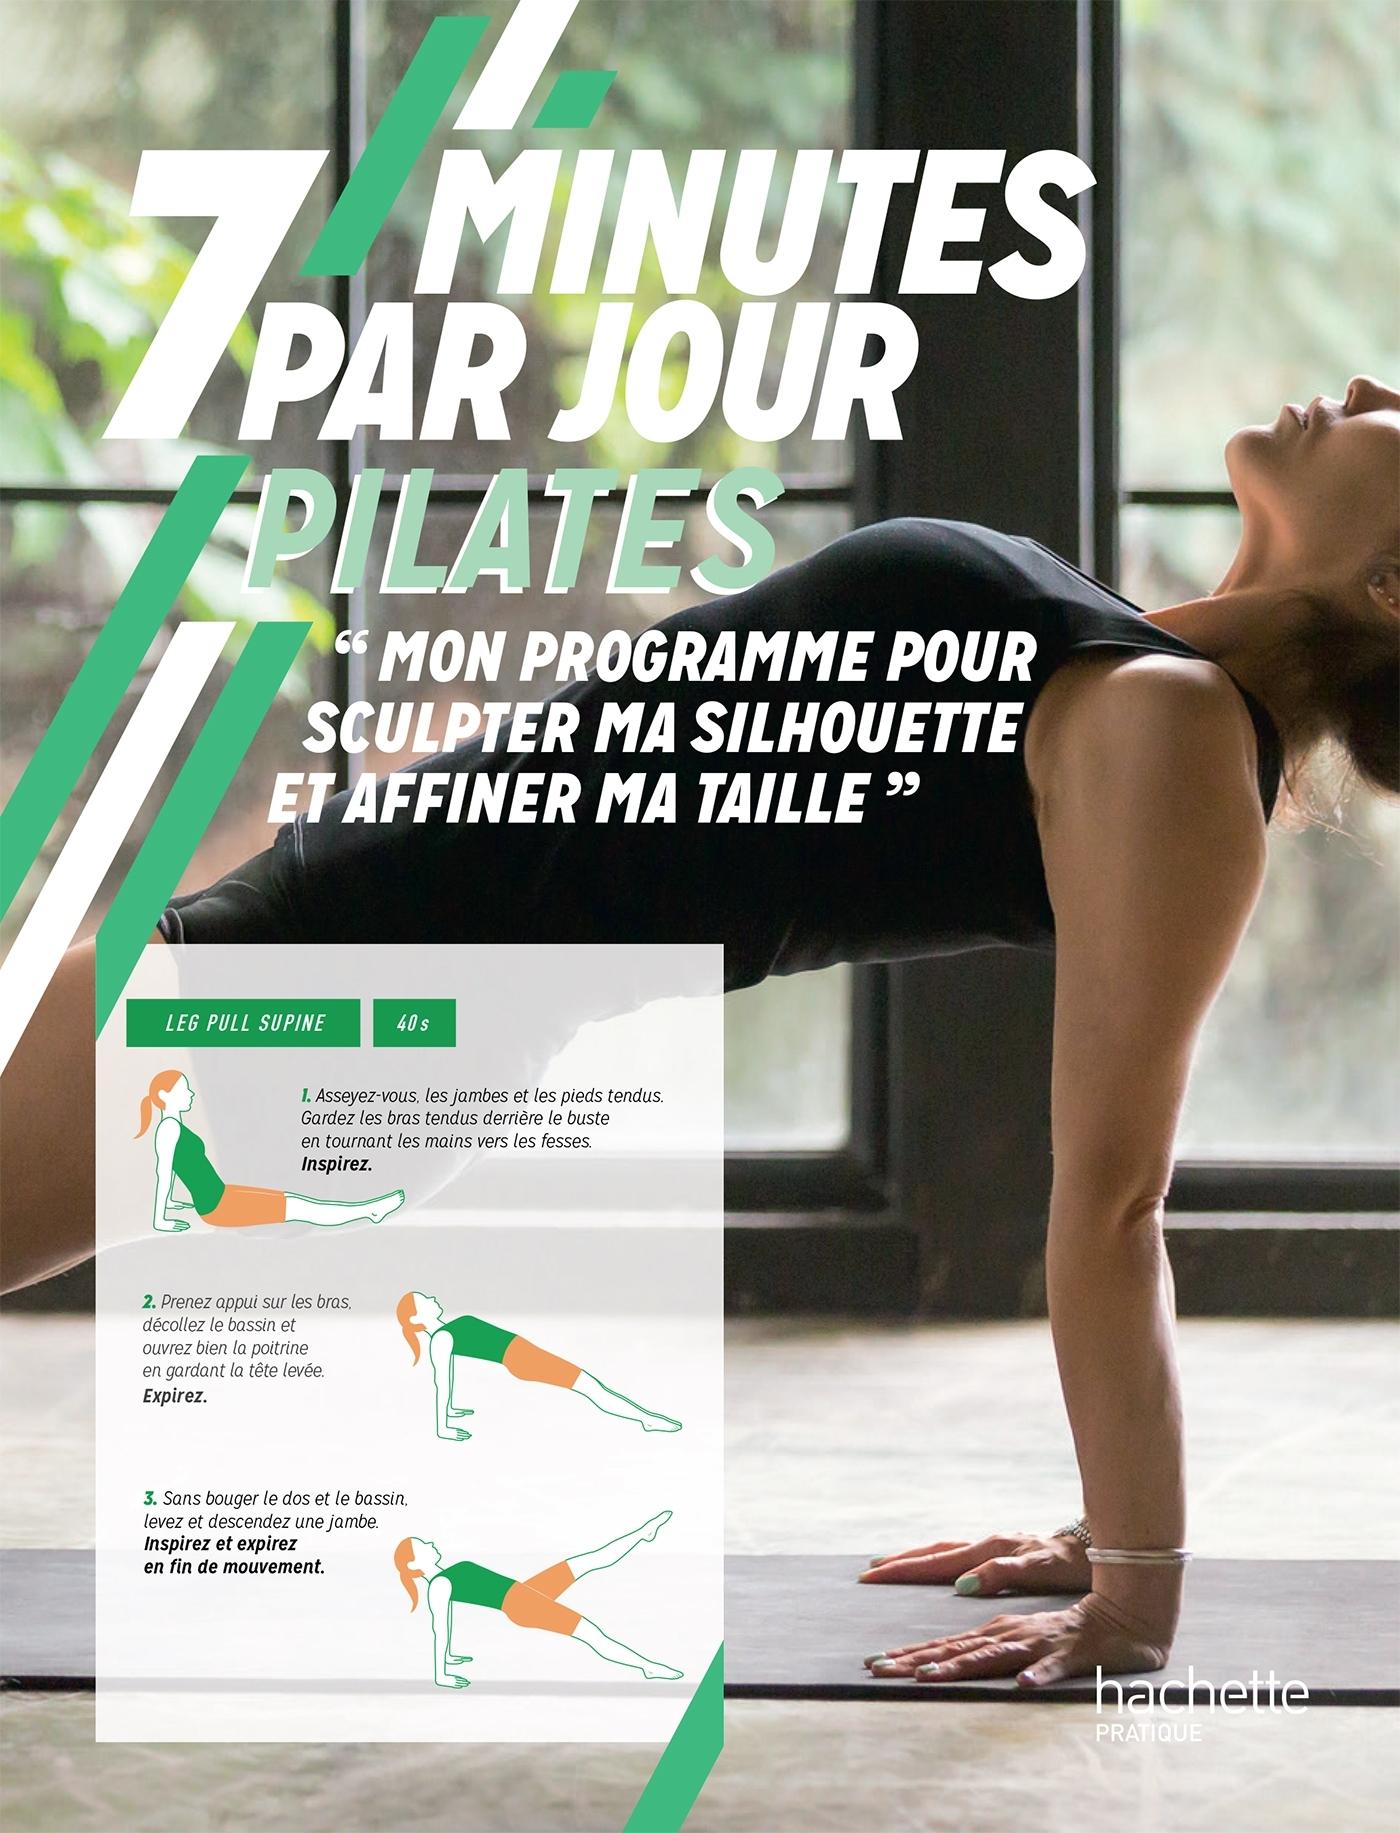 PILATES - MON PROGRAMME DE RENFORCEMENT PROFOND